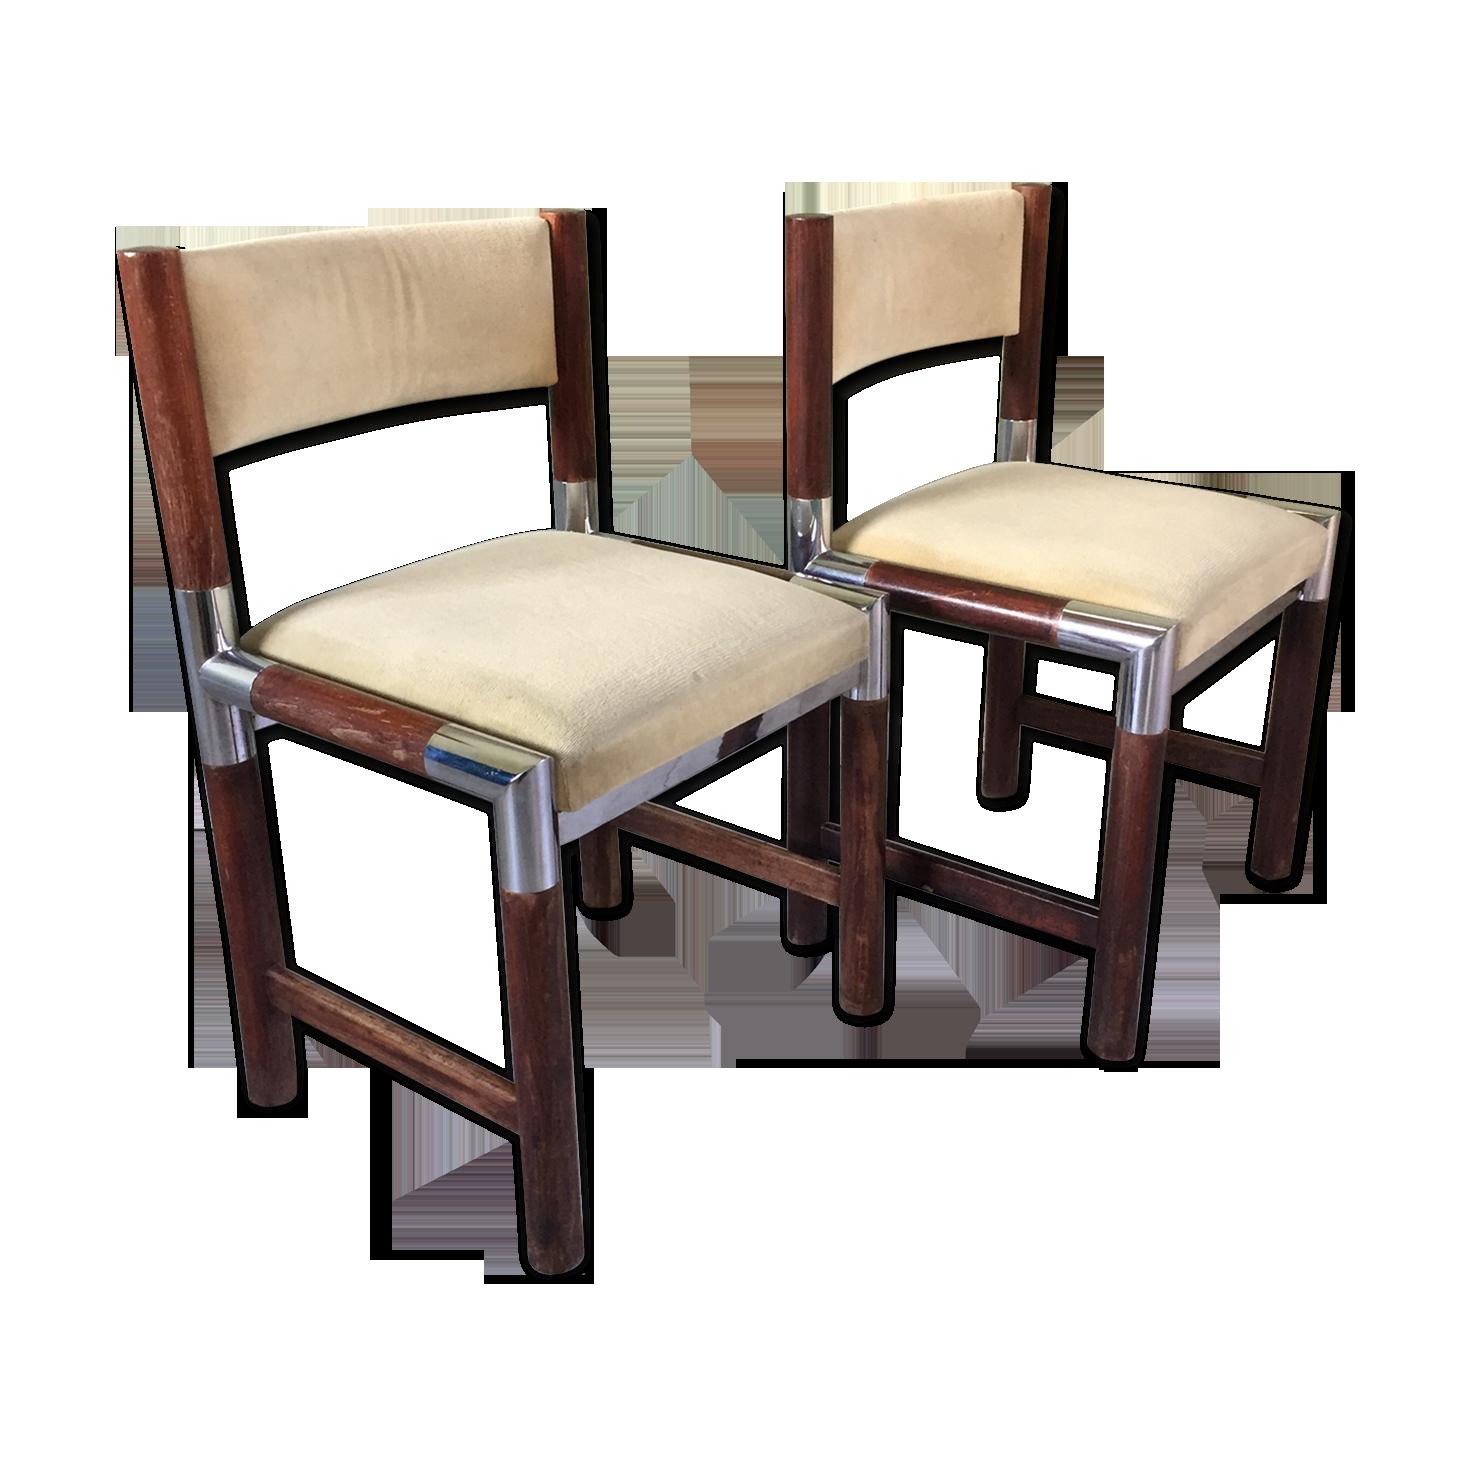 Pair of roche bobois chairs wood beige vintage eqadagu